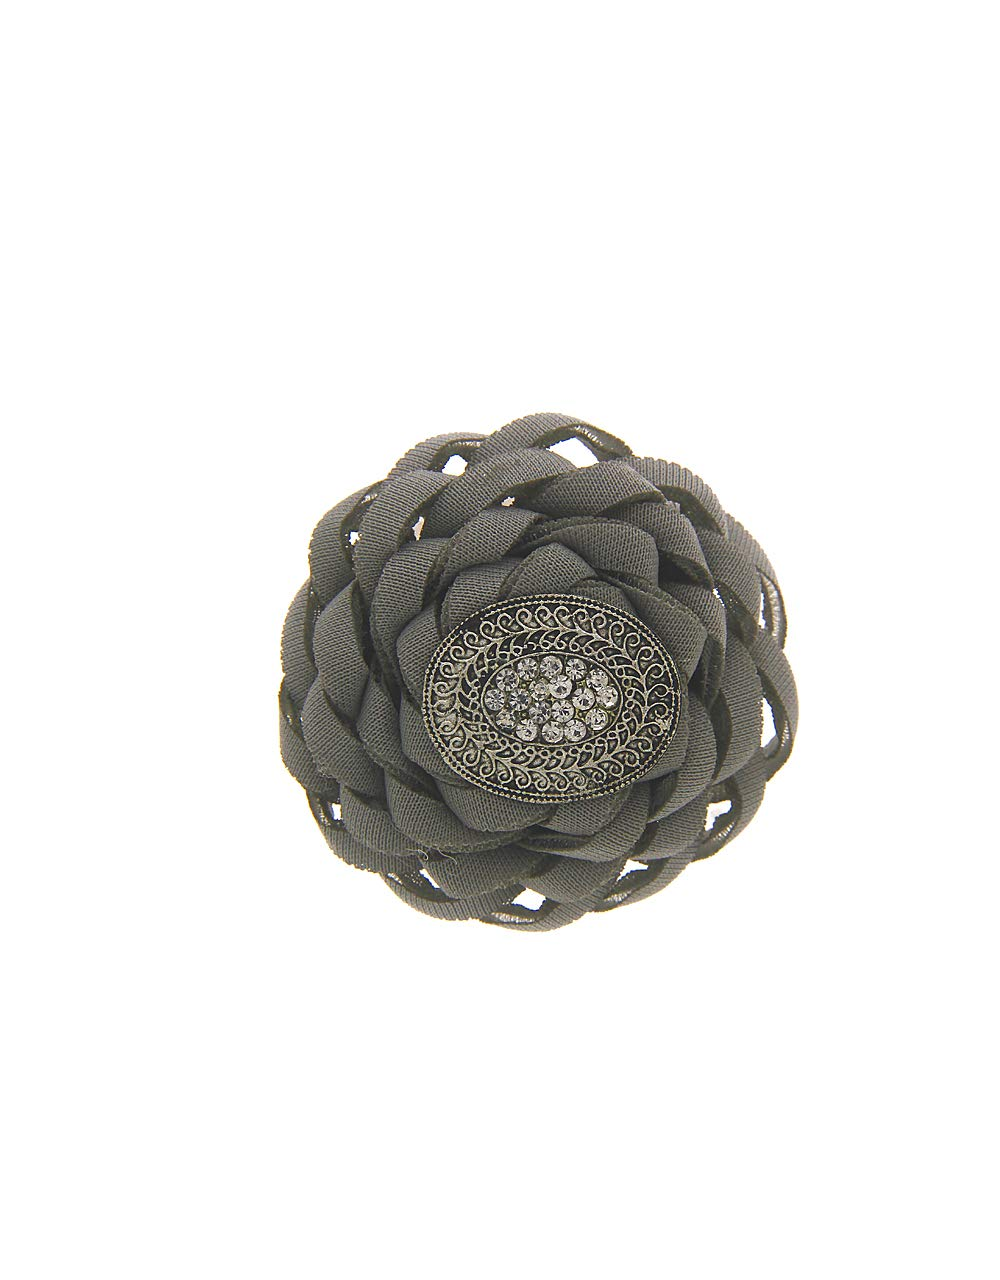 Anuradha Art Grey Colour Adorable Something Stylish Classy Sari Pin for Women/Girls